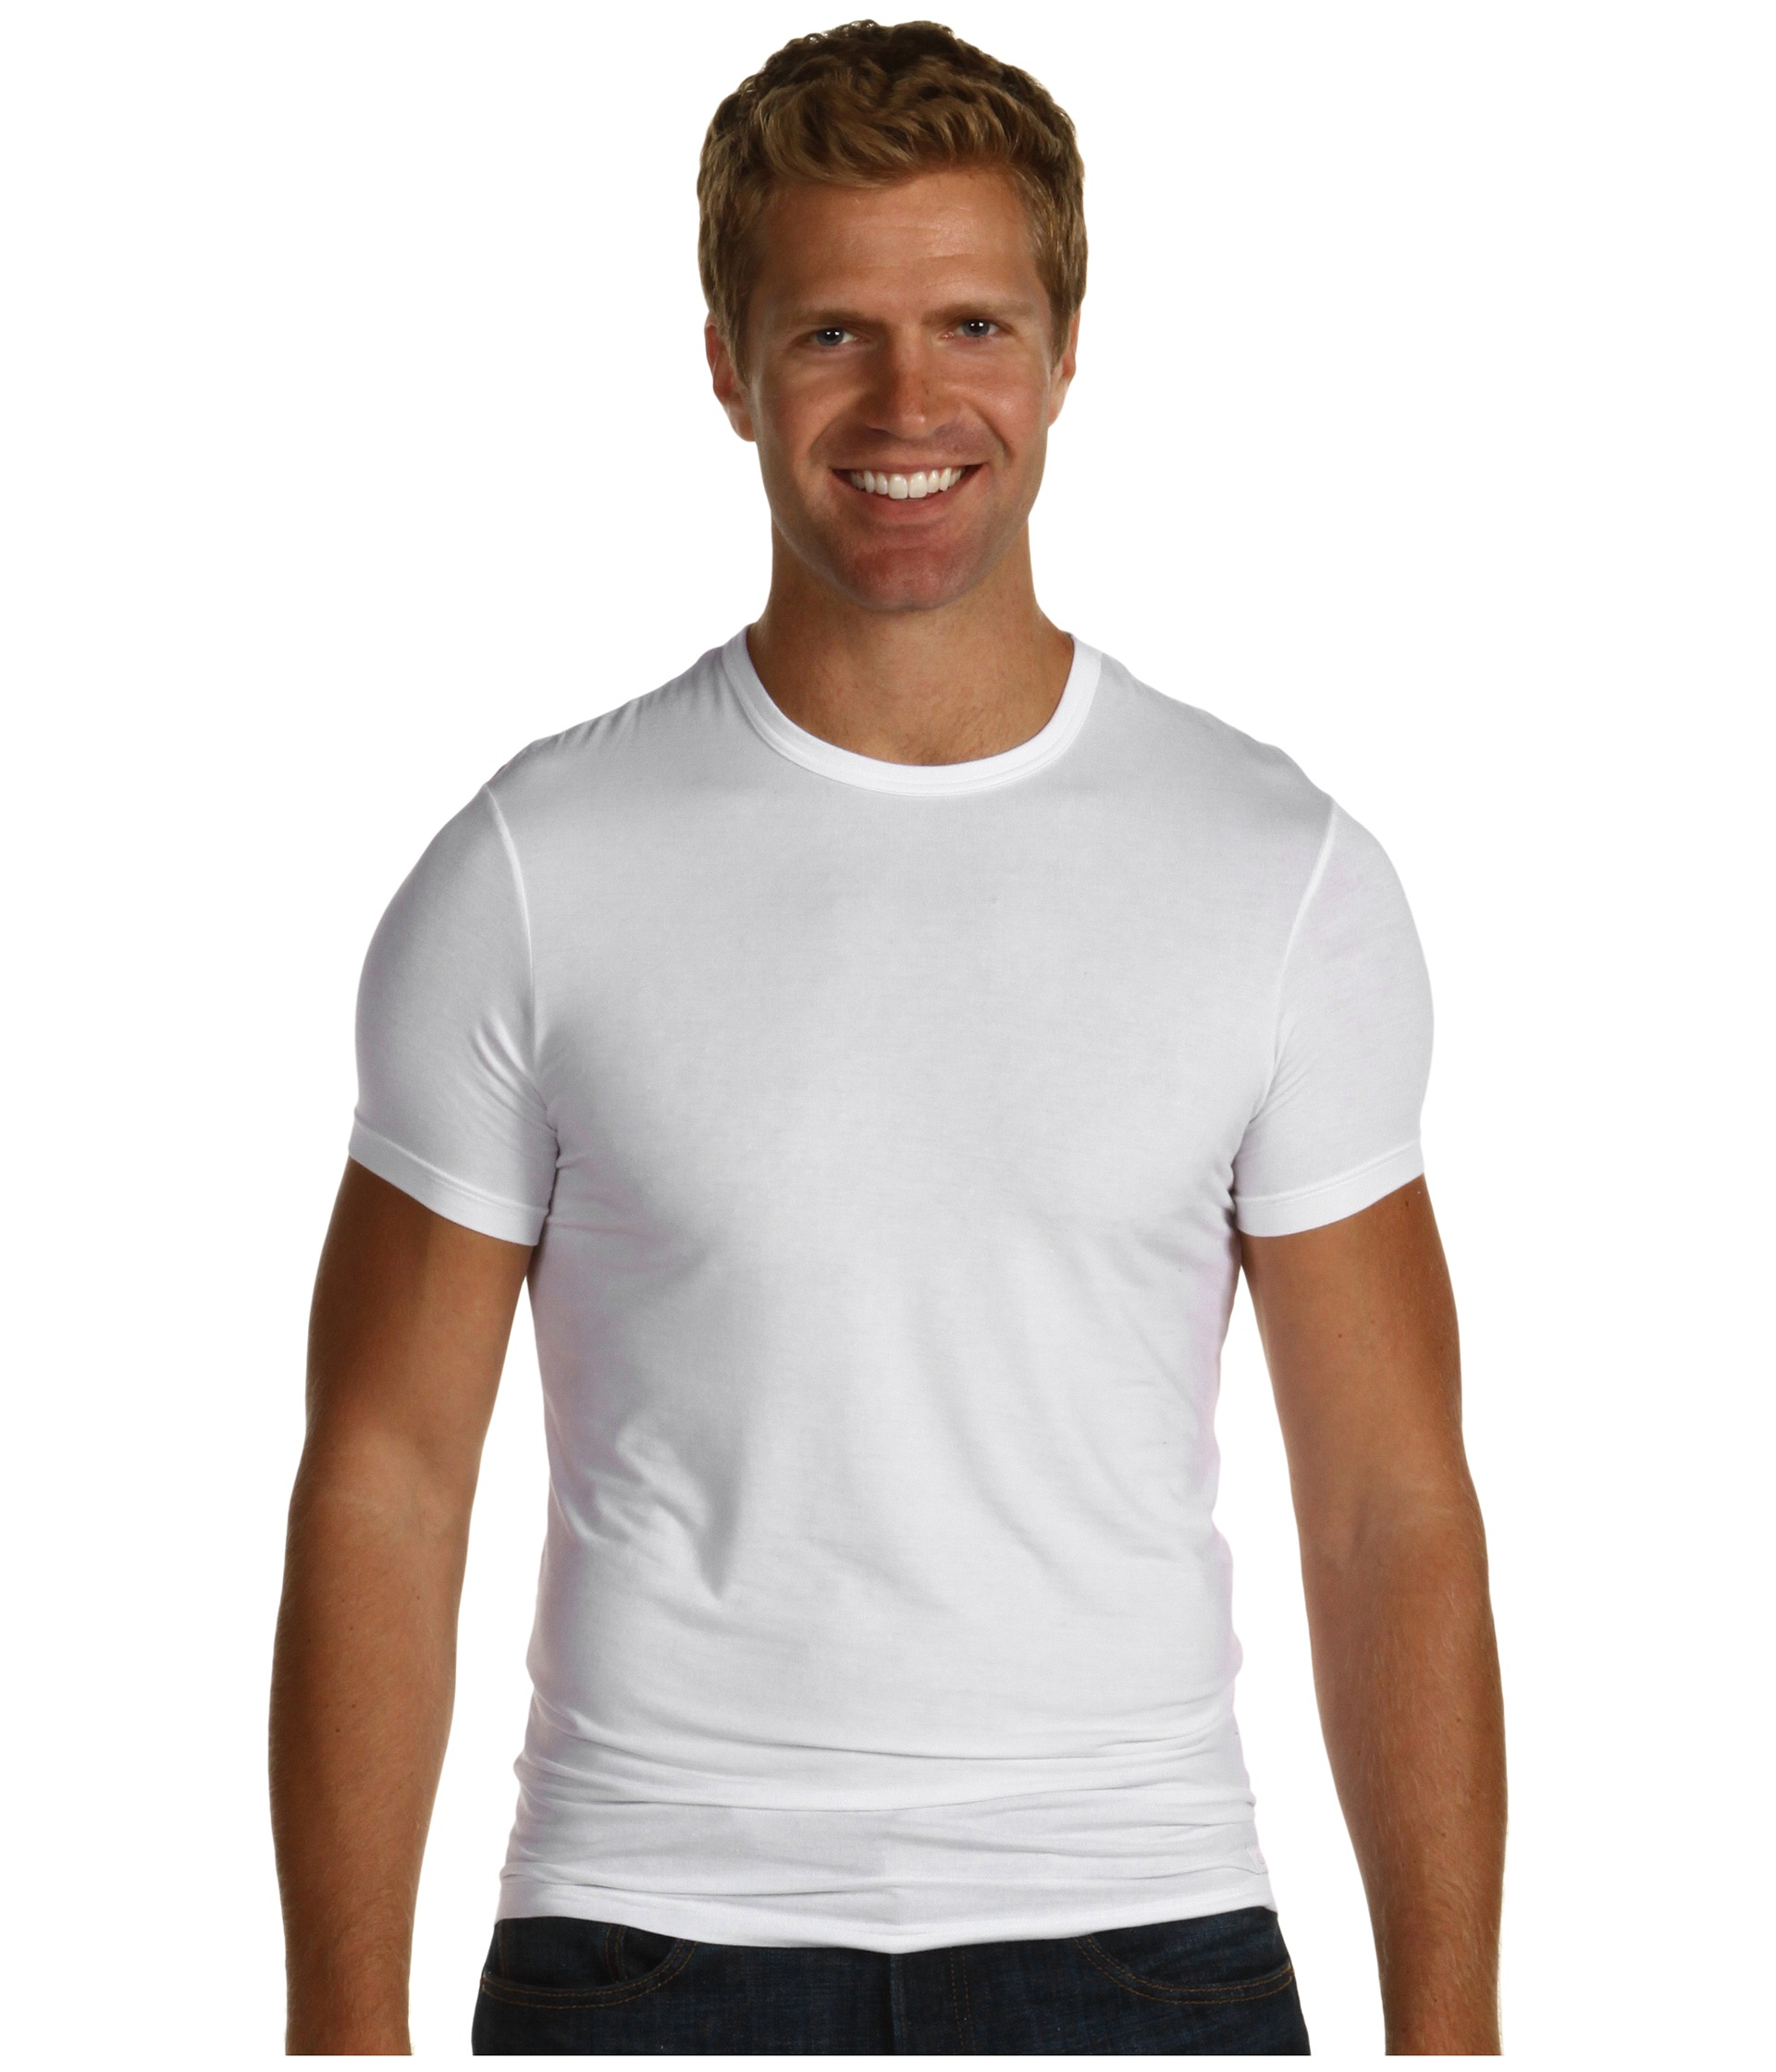 White t shirt calvin klein - White T Shirt Calvin Klein 40